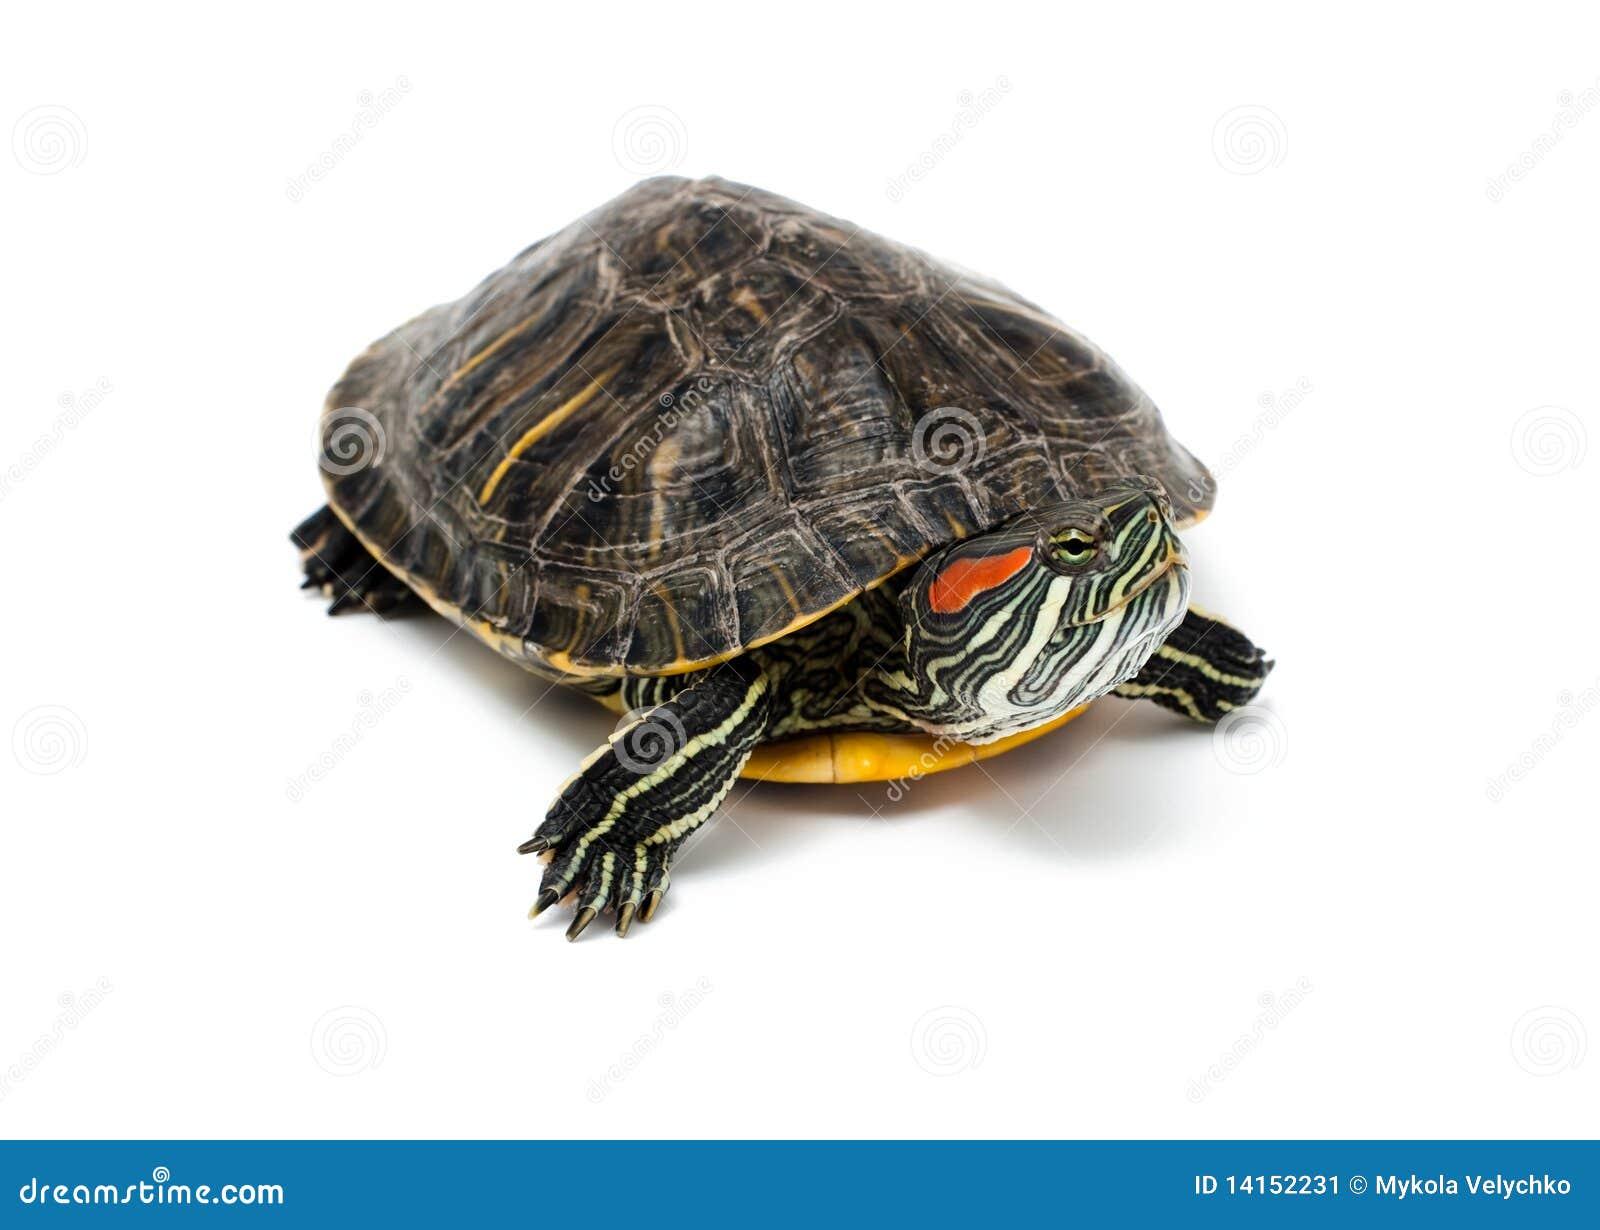 turtle white background - photo #7